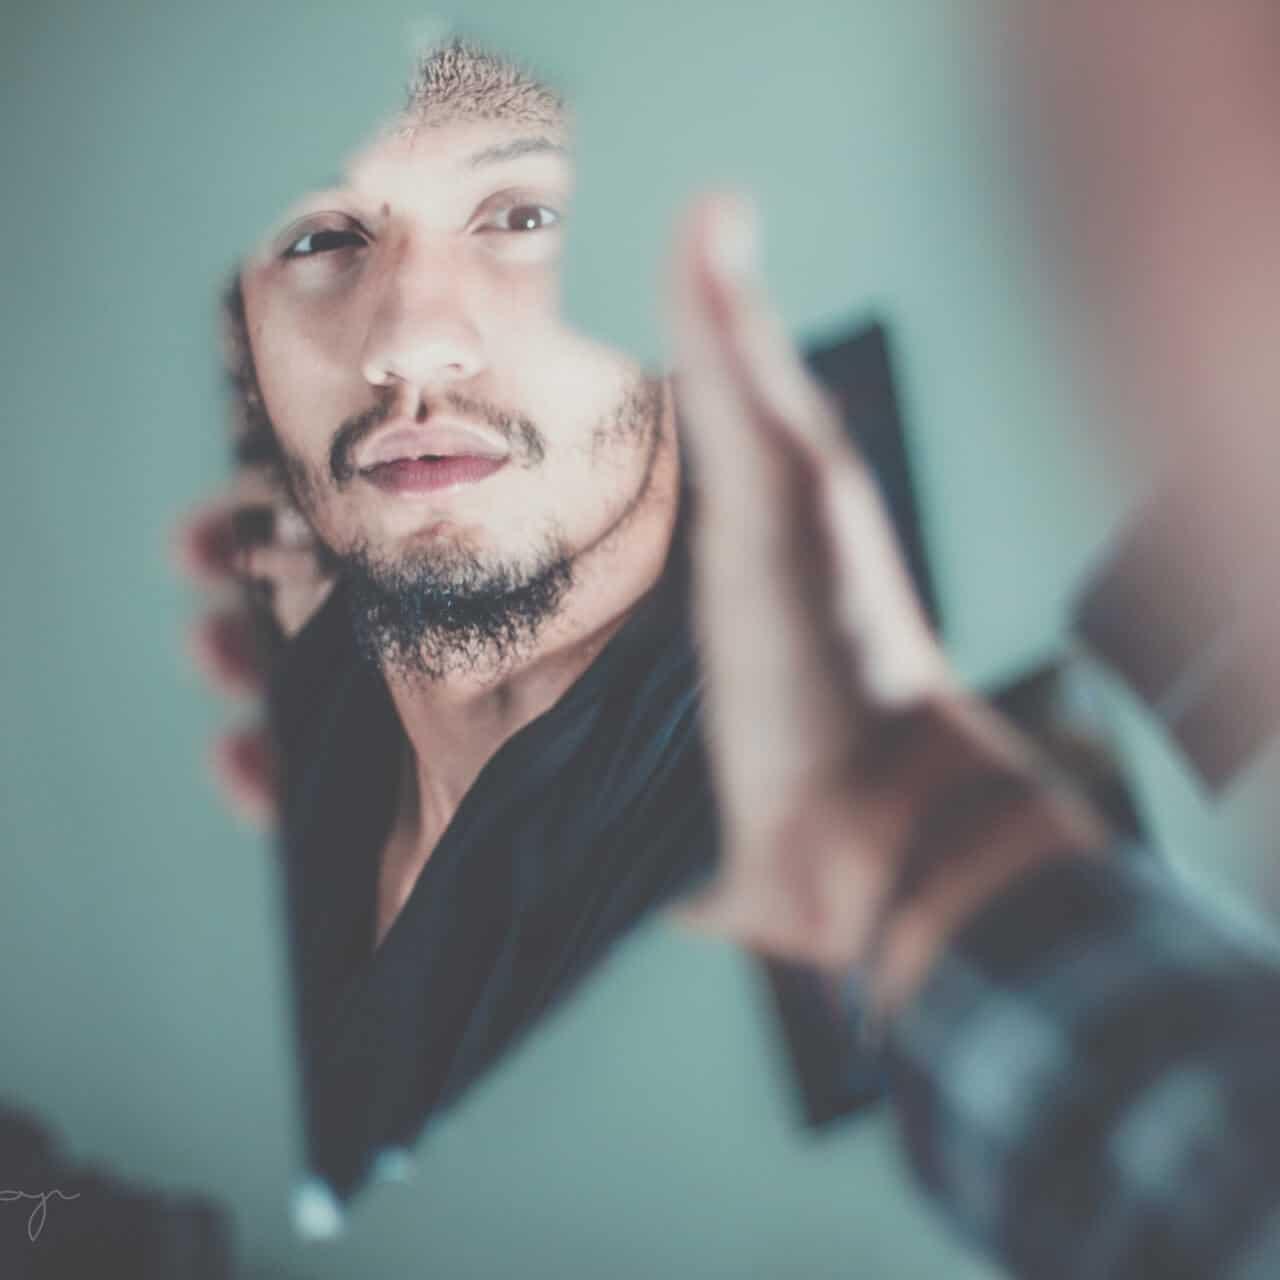 férfi tükörben